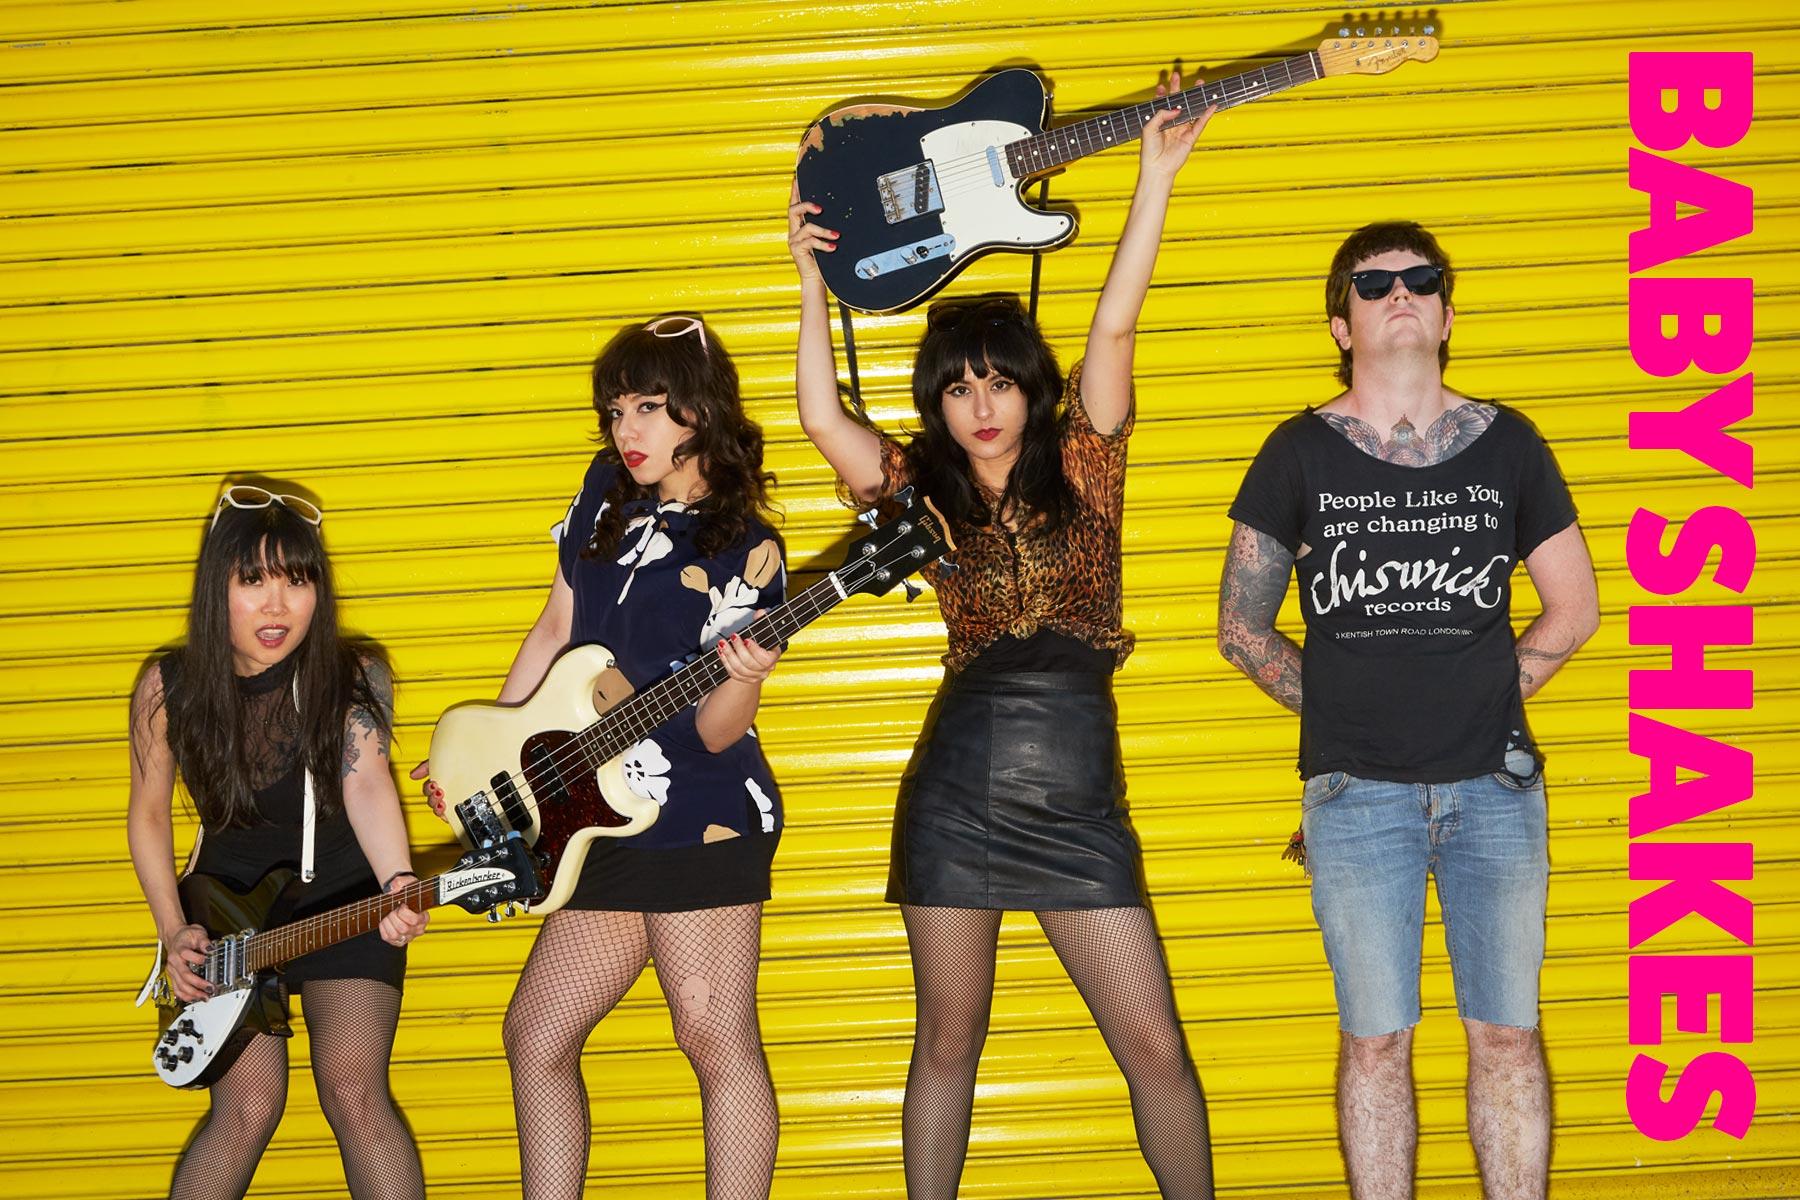 Babyshakes band from New York City. Photography by Alexander Thompson for Ponyboy magazine.